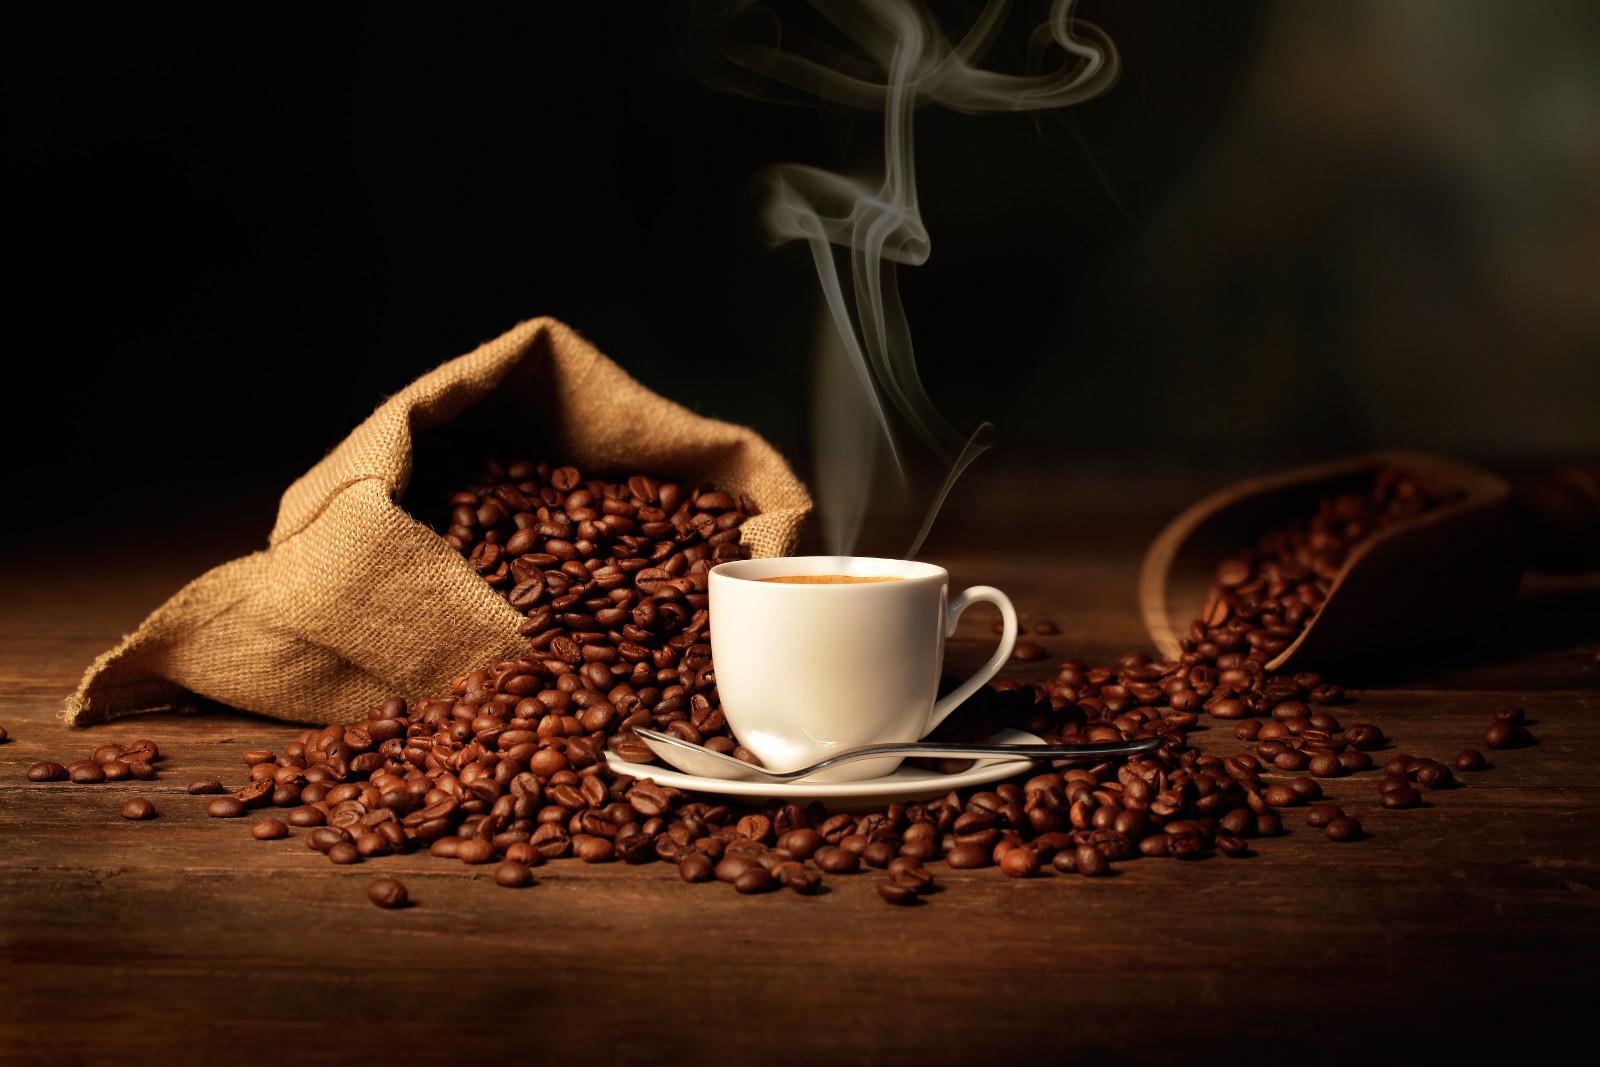 روغن قهوه